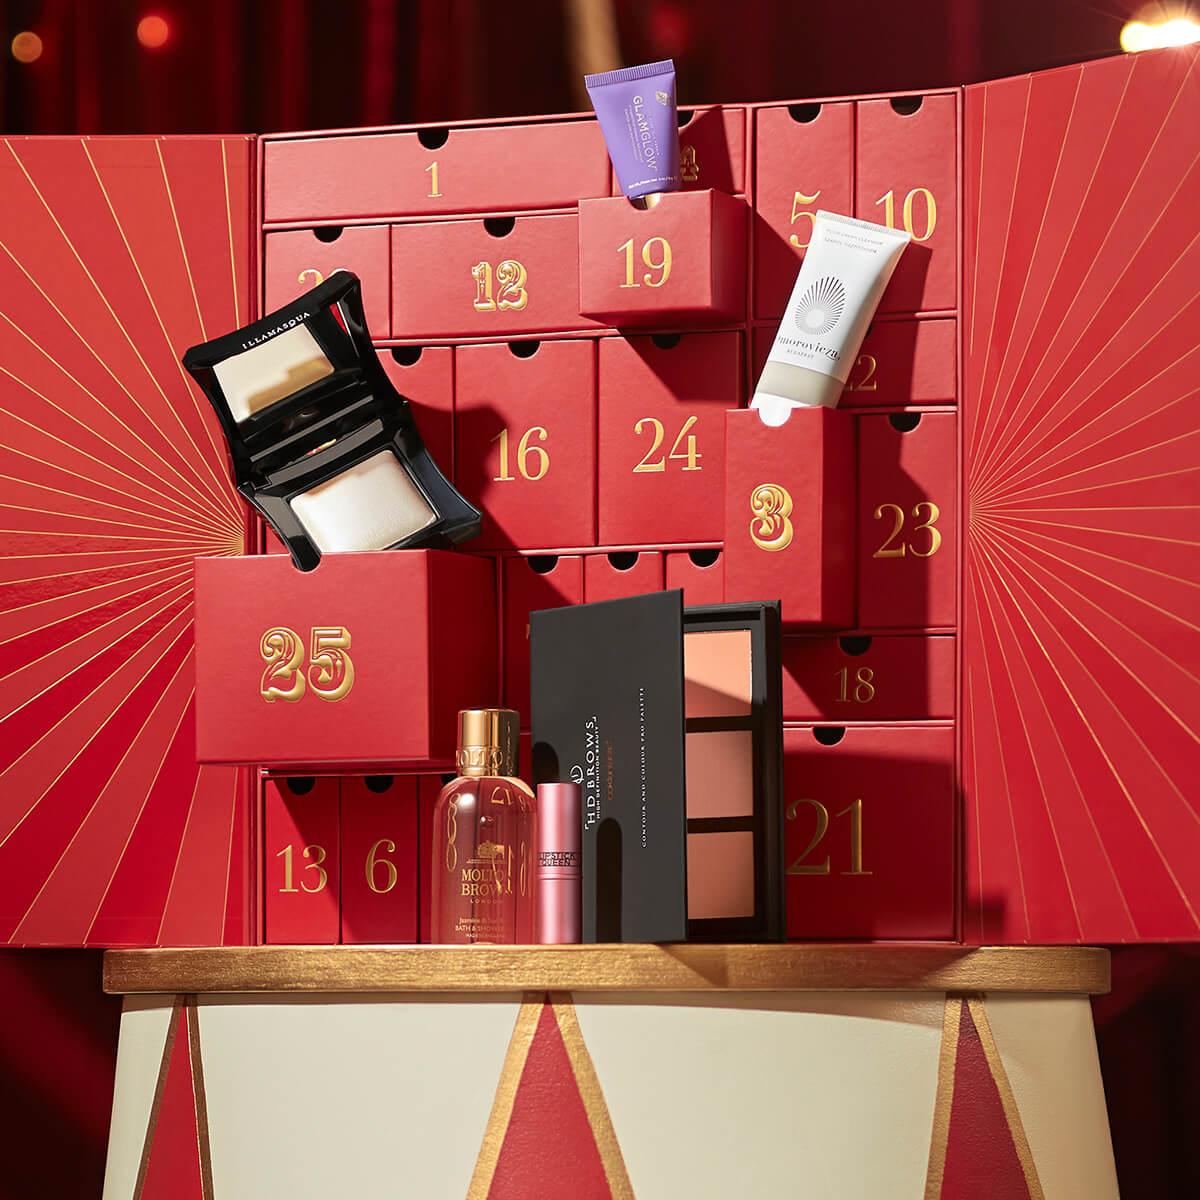 lookfantastic Adventskalender mit 20% Rabatt oder mit der Lookfantastic Beauty Box